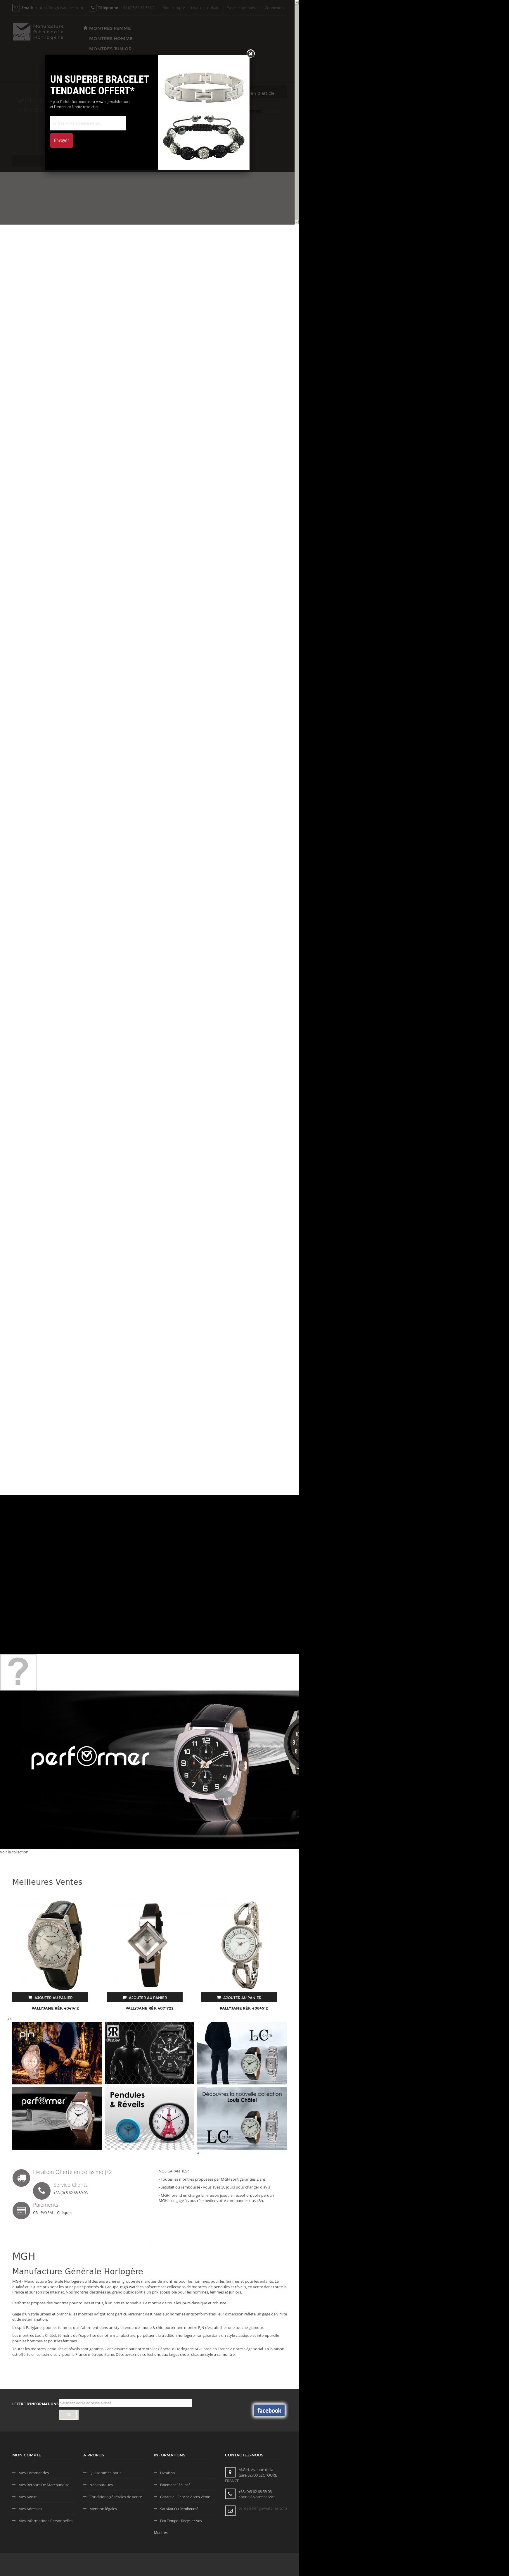 Tempojoya Competitors, Revenue and Employees - Owler Company Profile